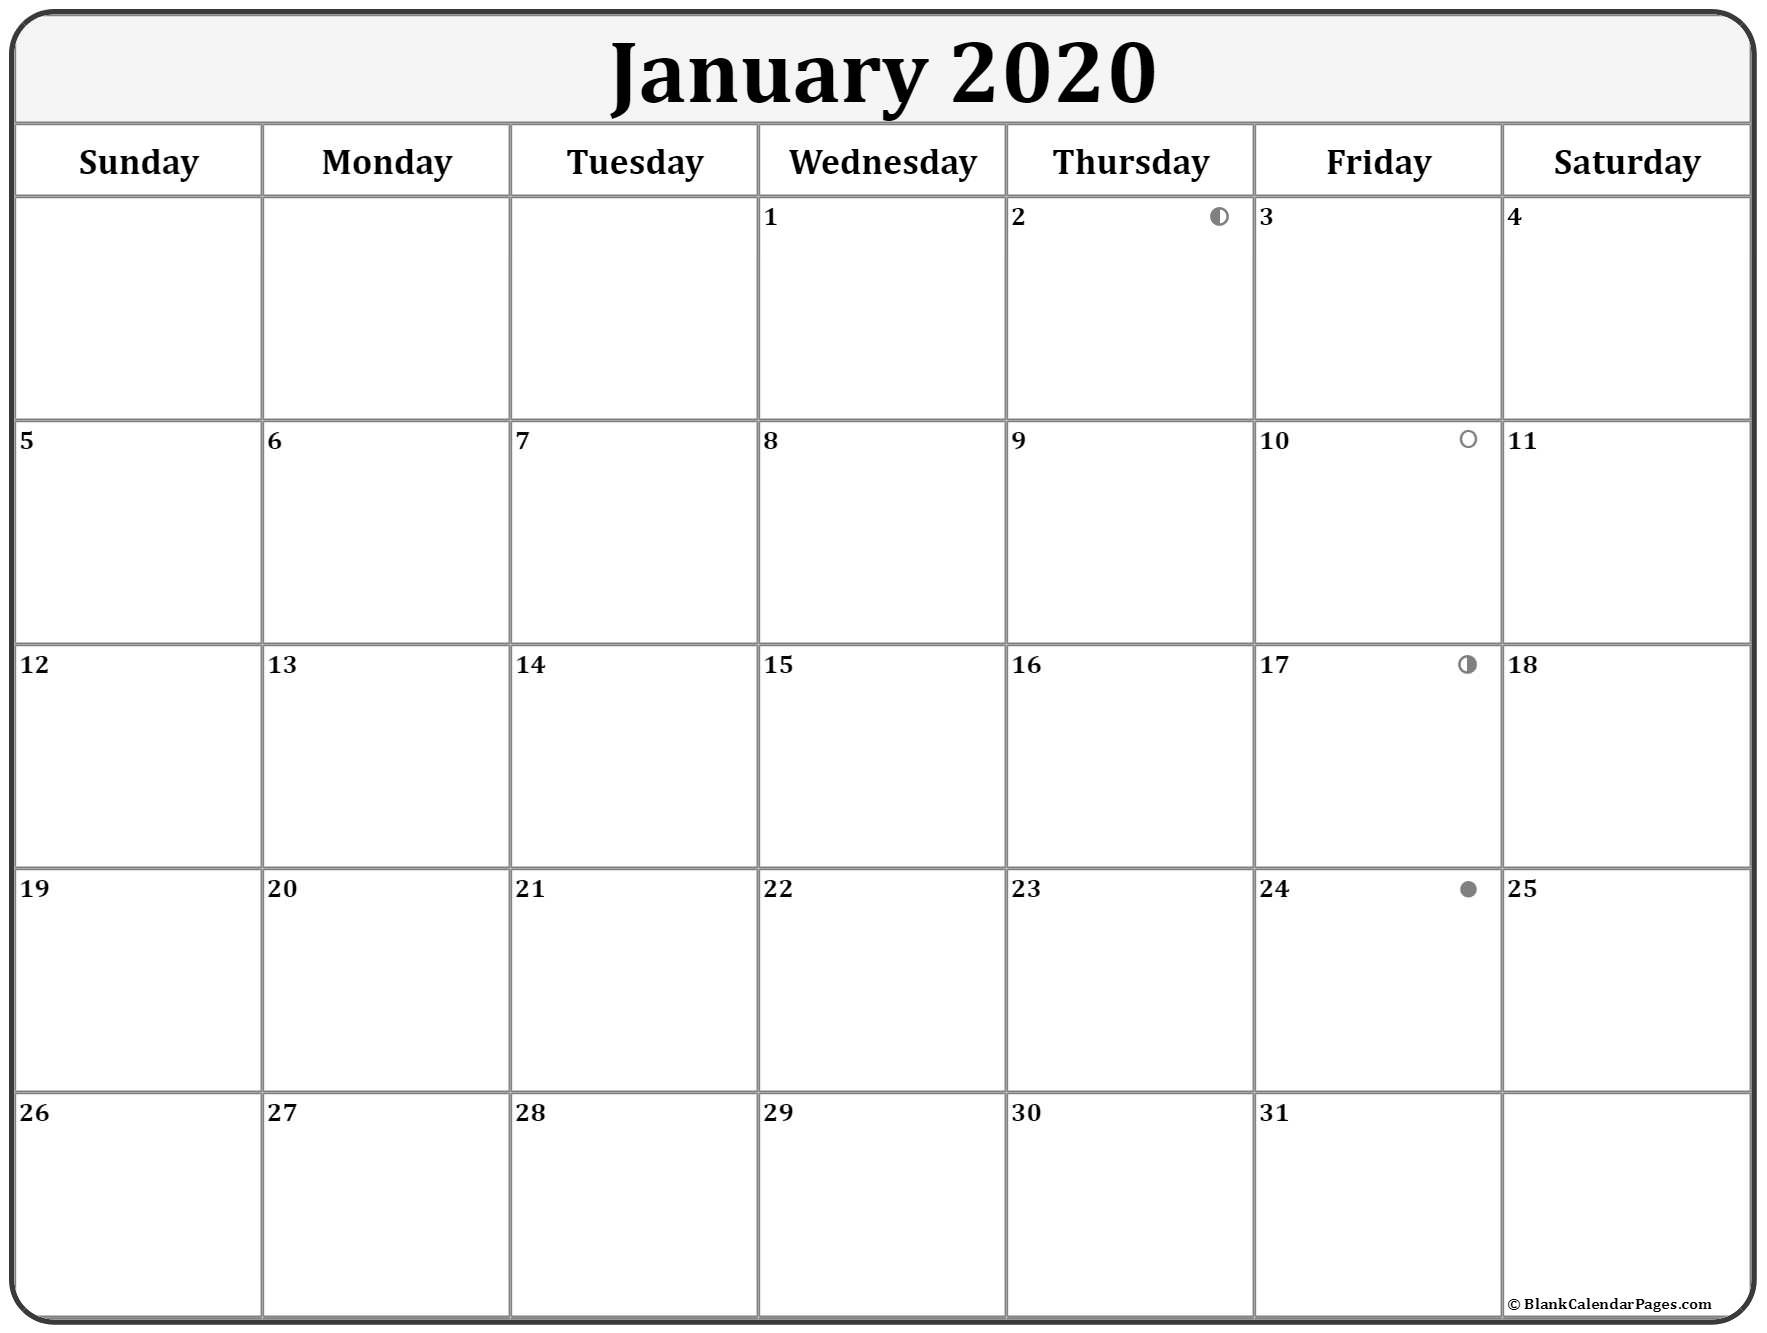 January 2020 Lunar Calendar | Moon Phase Calendar-January 2020 Lunar Calendar